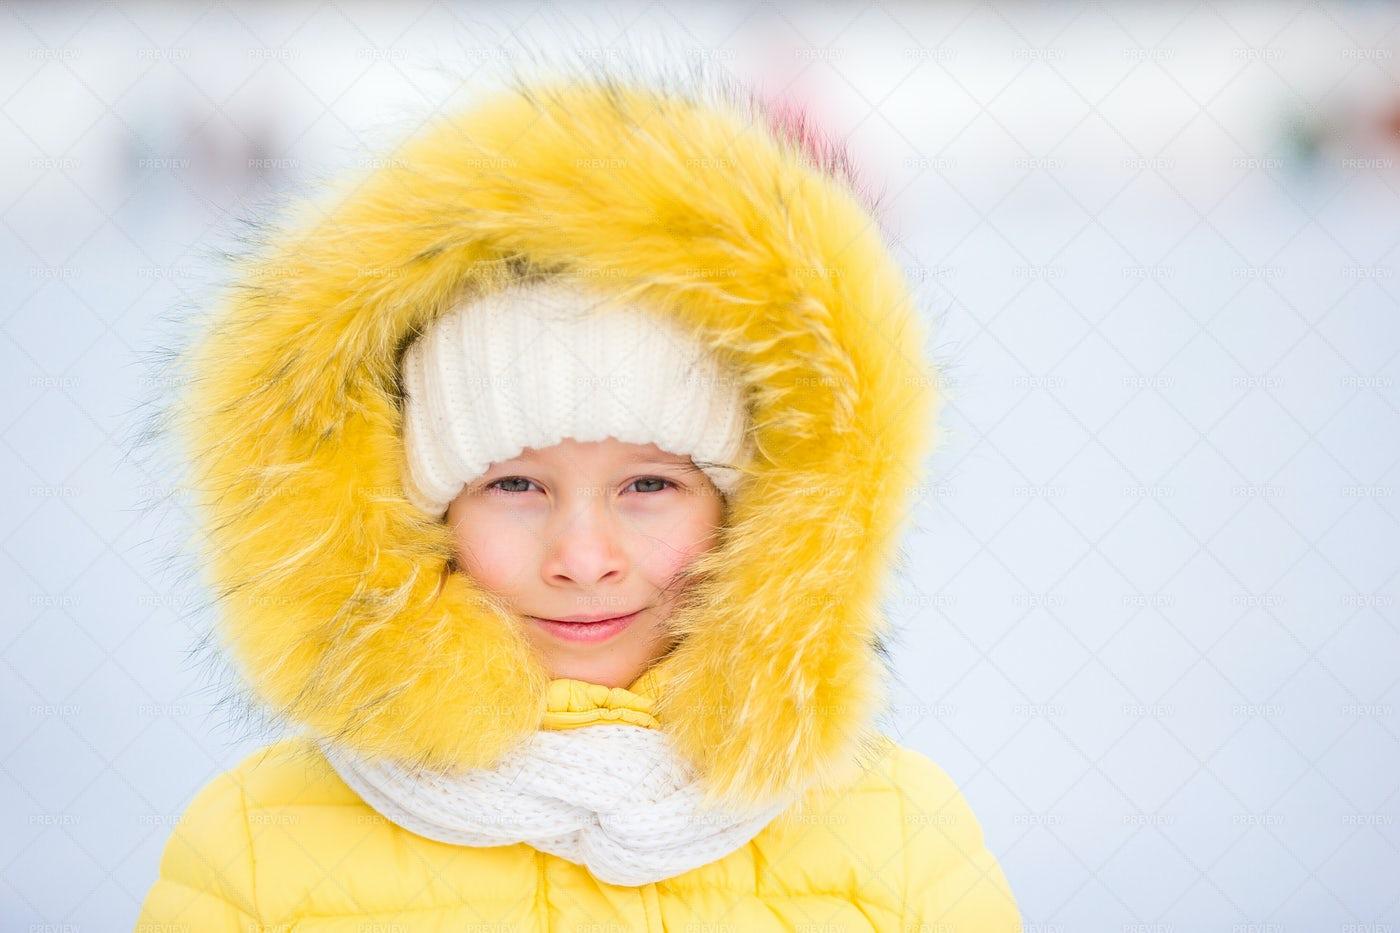 Her Yellow Winter Coat: Stock Photos